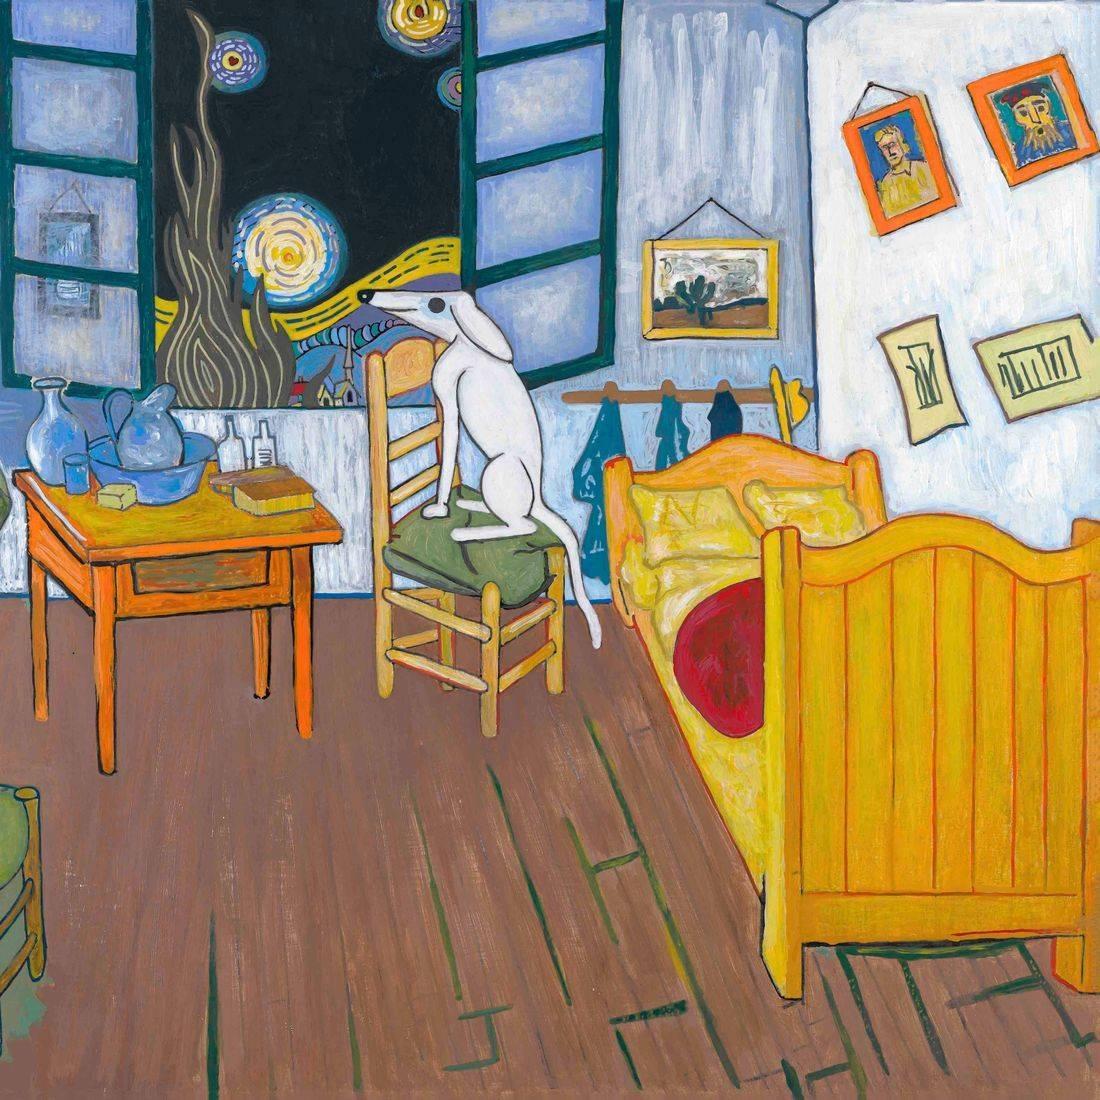 Vincent Van Gogh, The Bedroom, Starry Night, Dog, Pet, Artists' Pets, Man's Best Friend